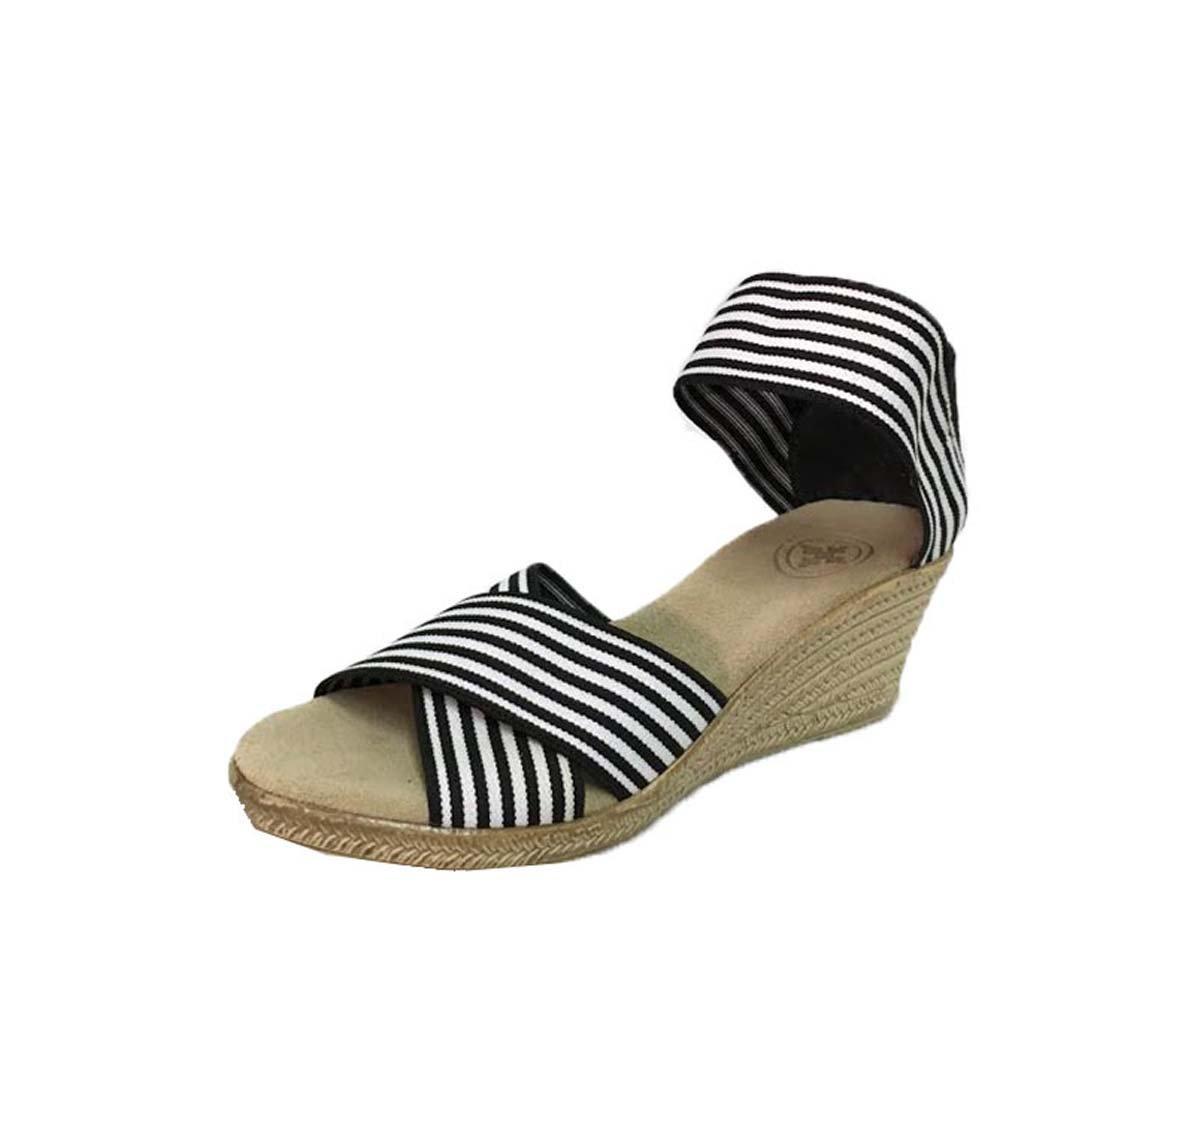 Cannon Criss-Cross Espadrille Wedge Sandal by Charleston Shoe Co. B07DRC15JS 8 B(M) US|Black Striped